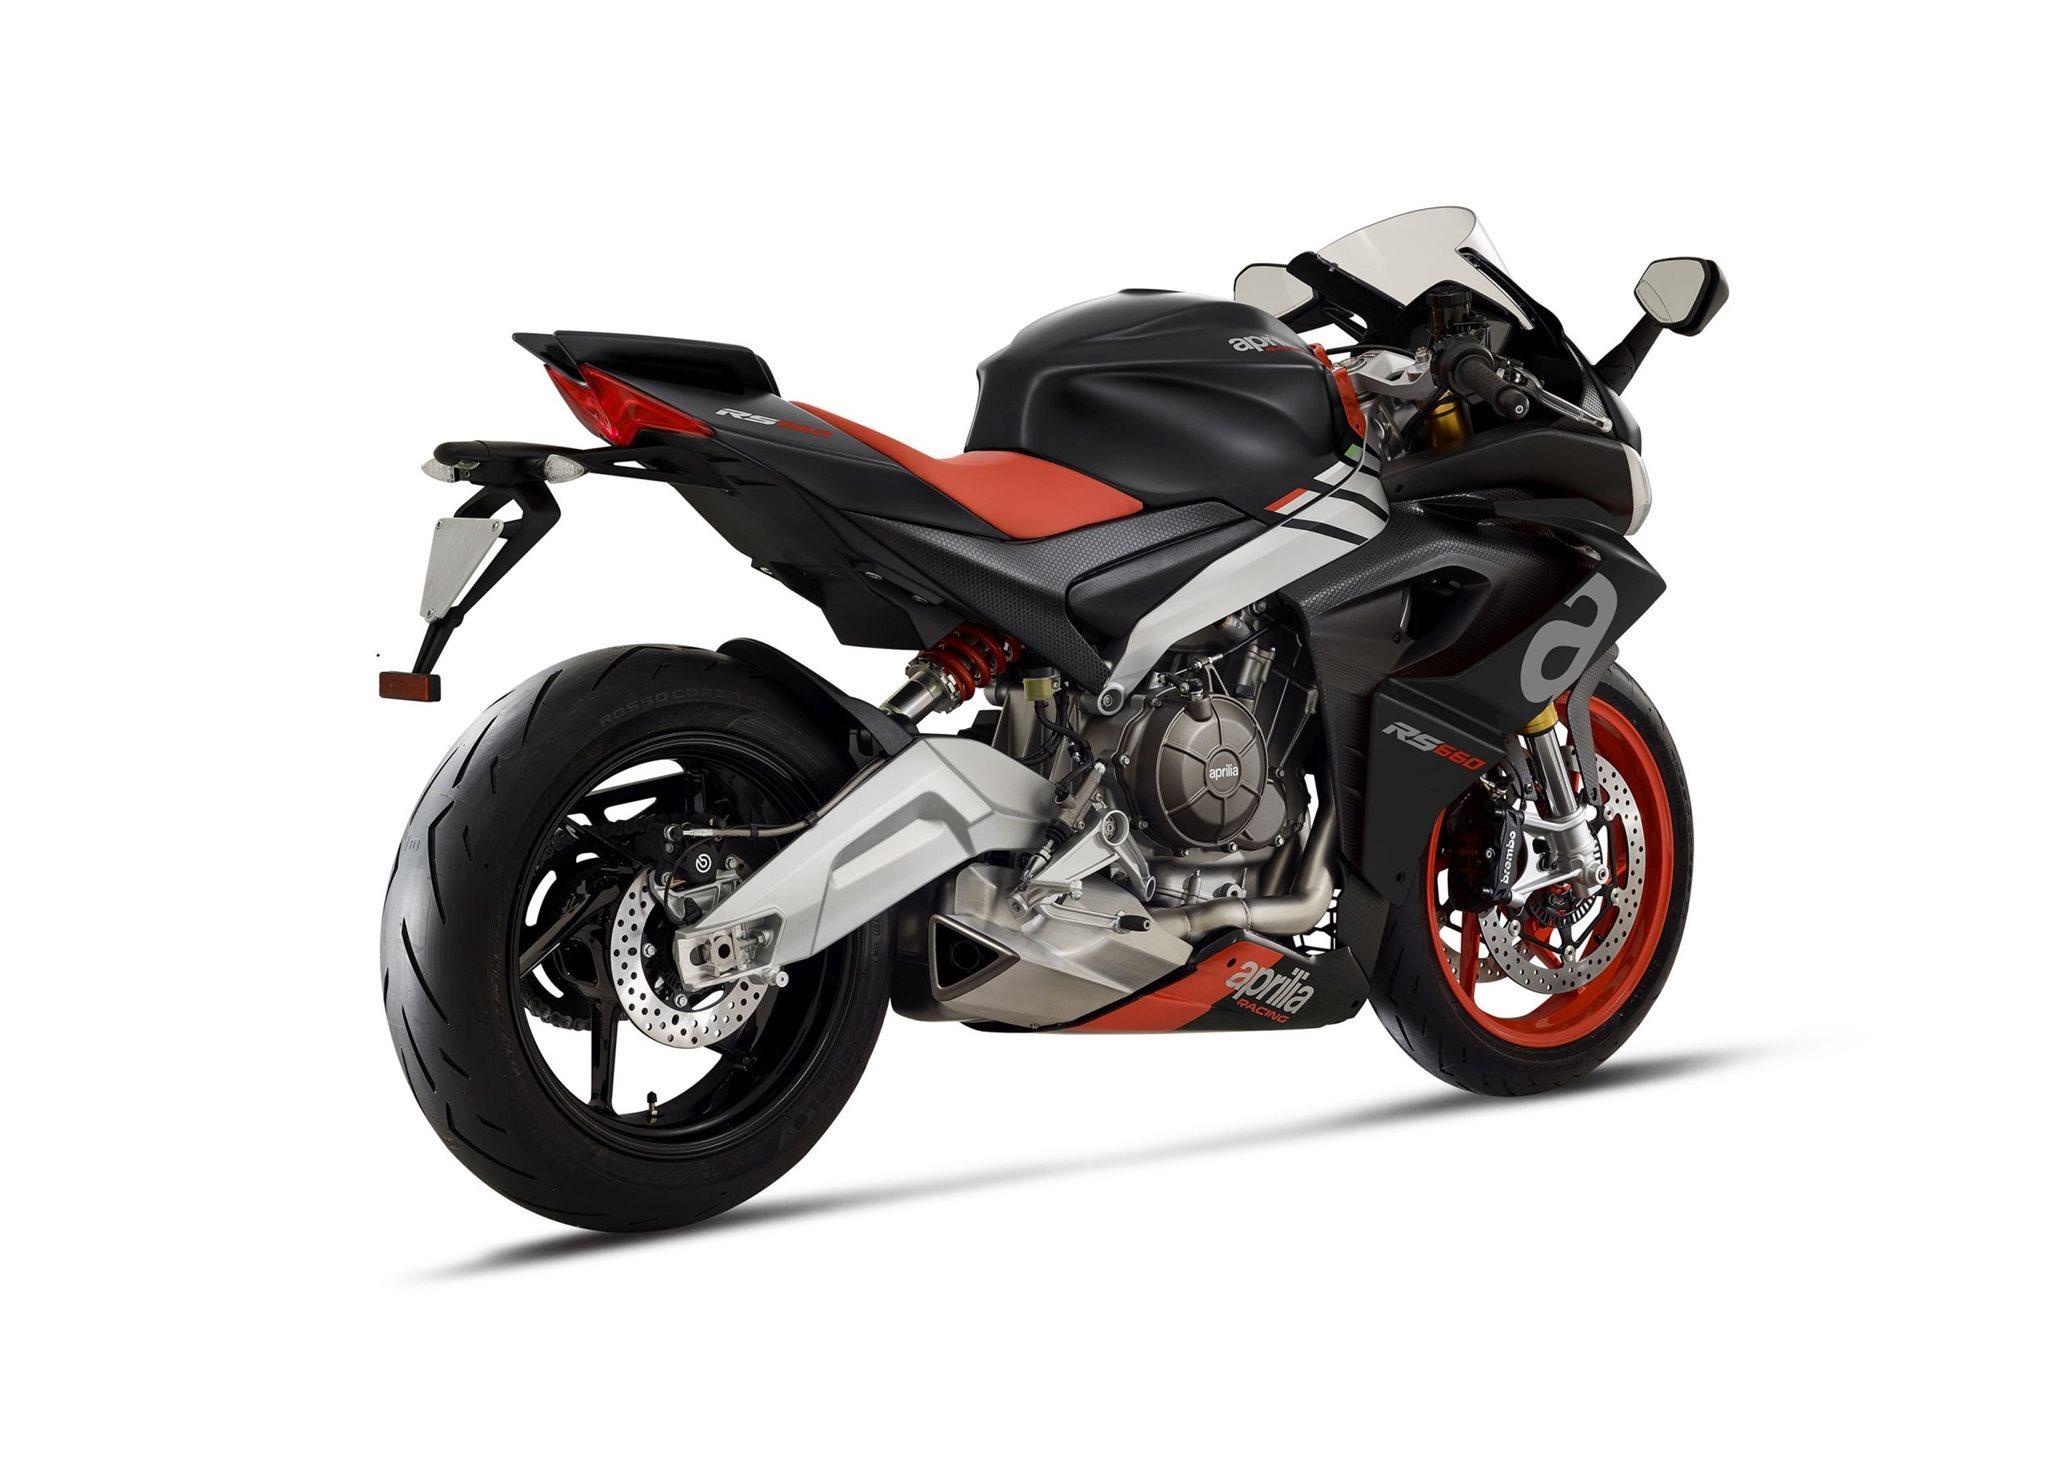 Aprilia RS 660 Motorrad, neu